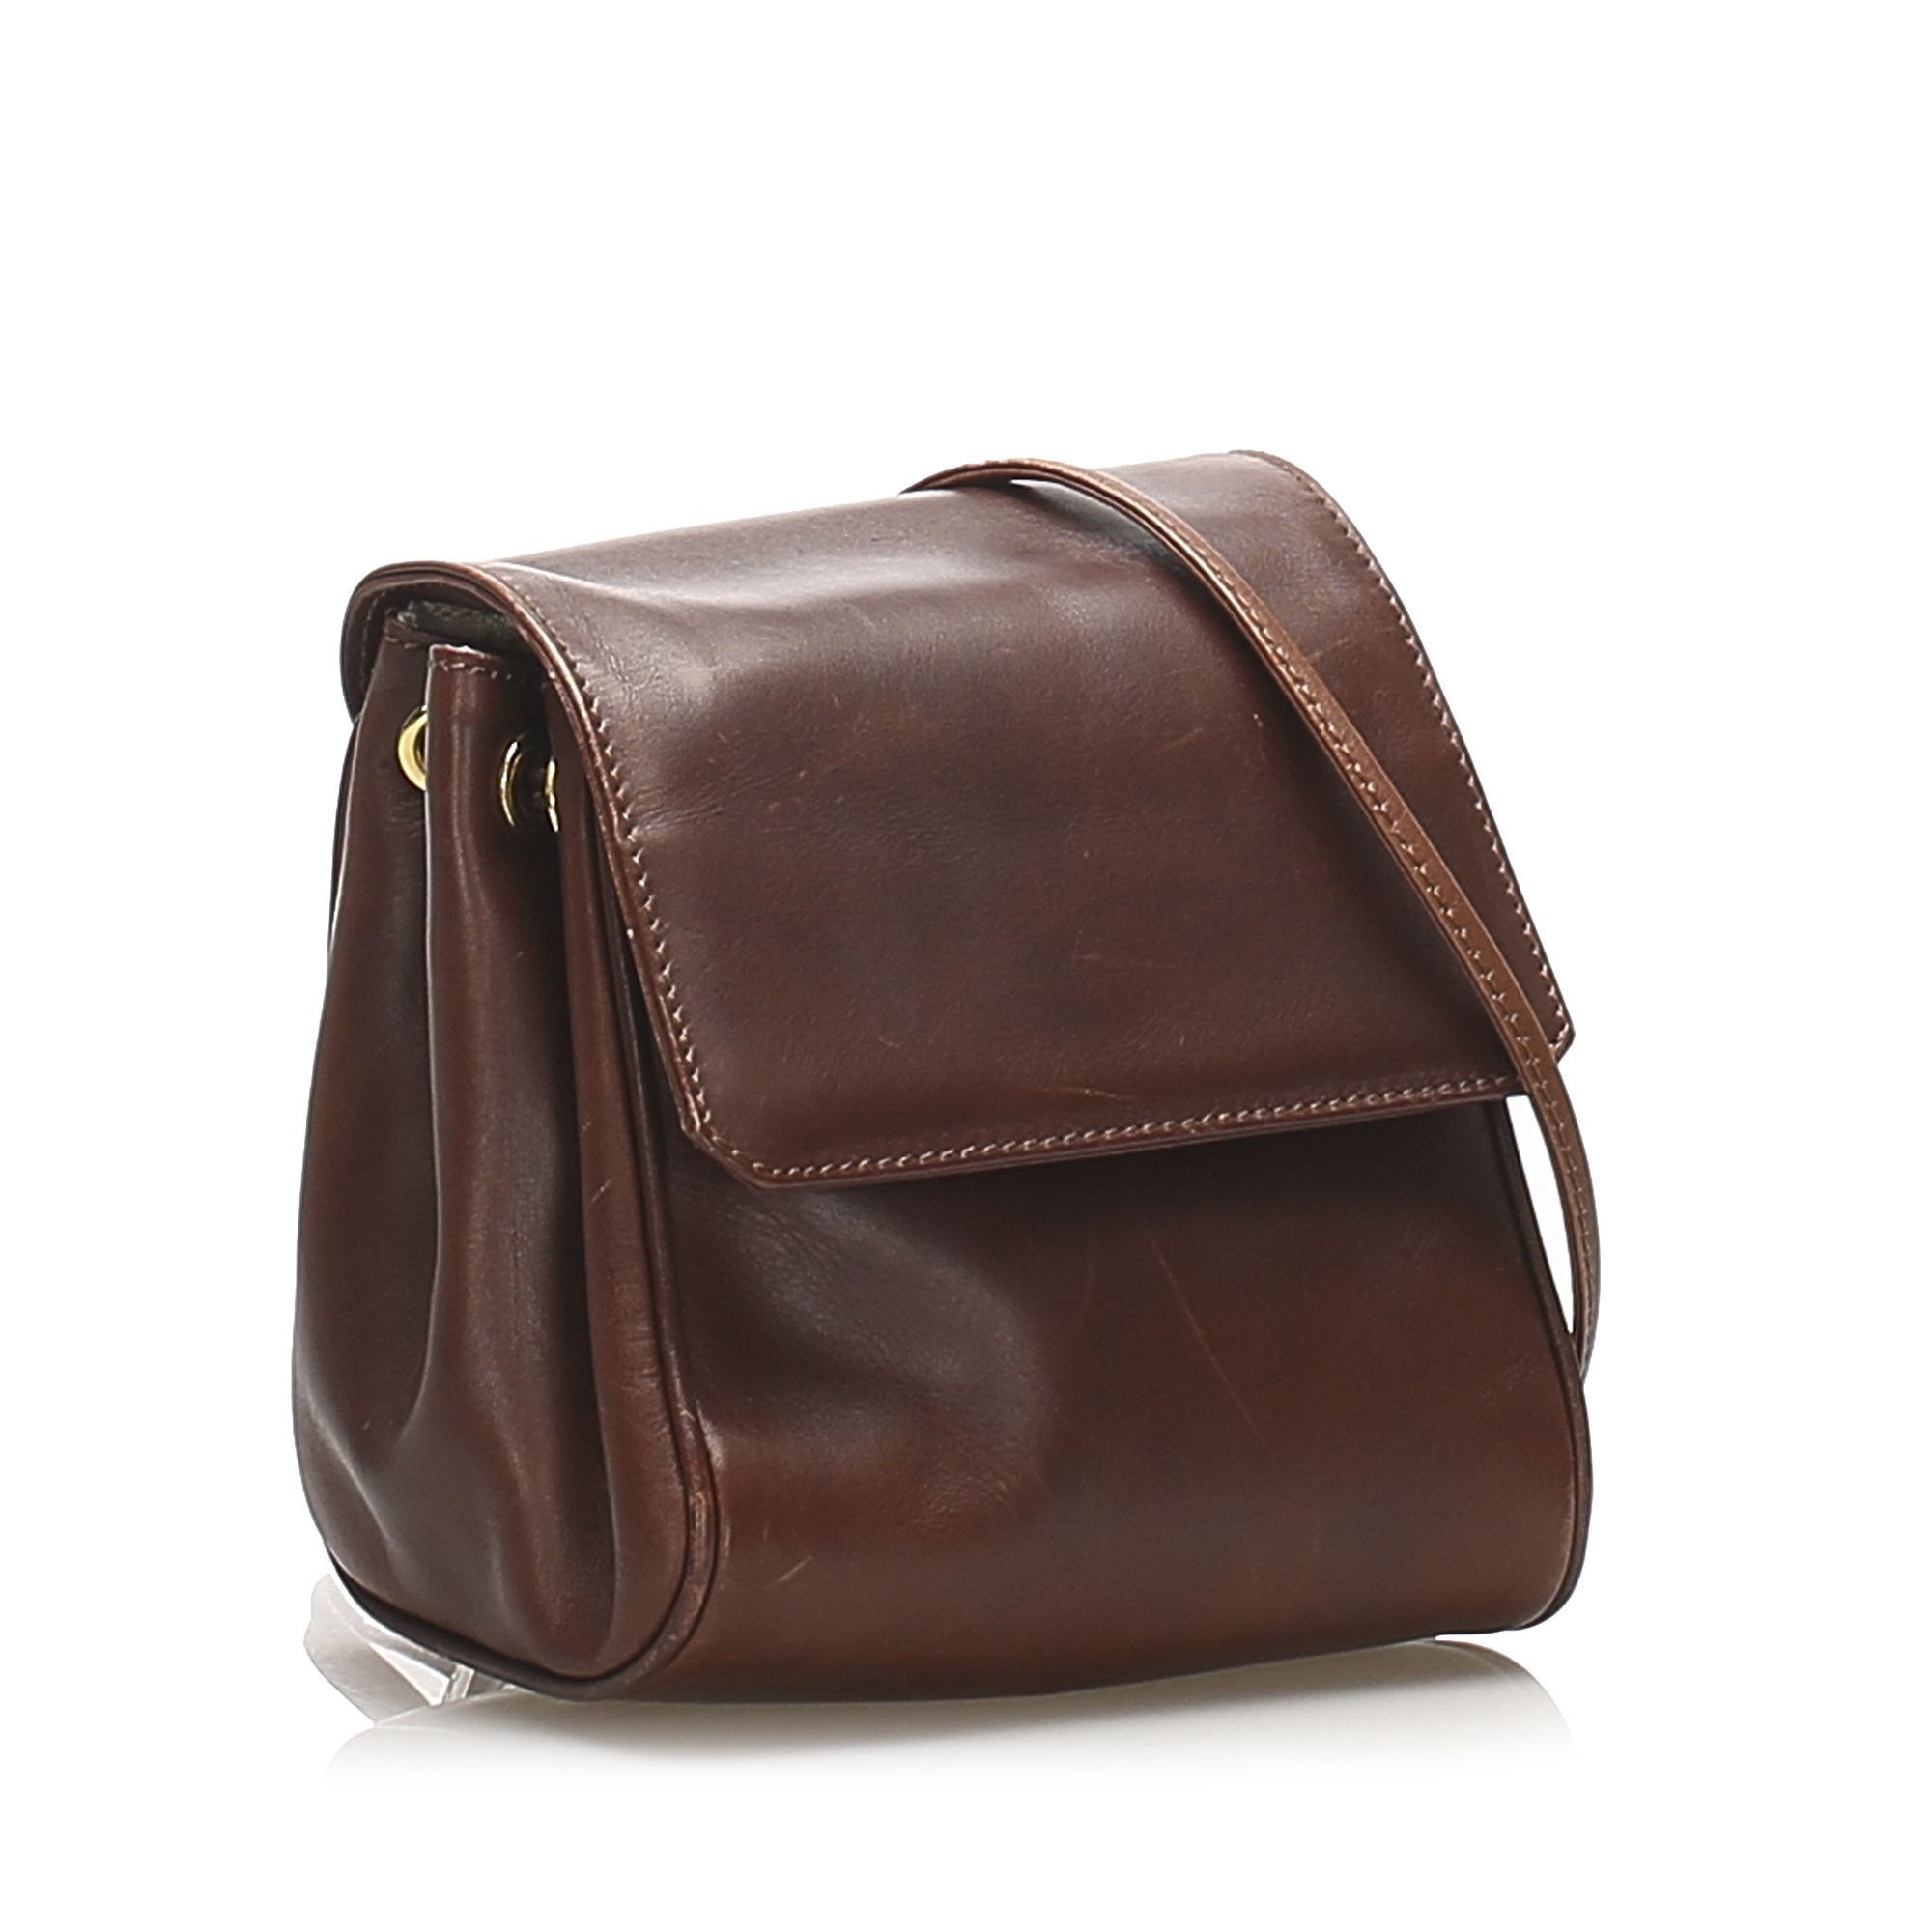 Vintage Dior Leather Crossbody Bag Brown